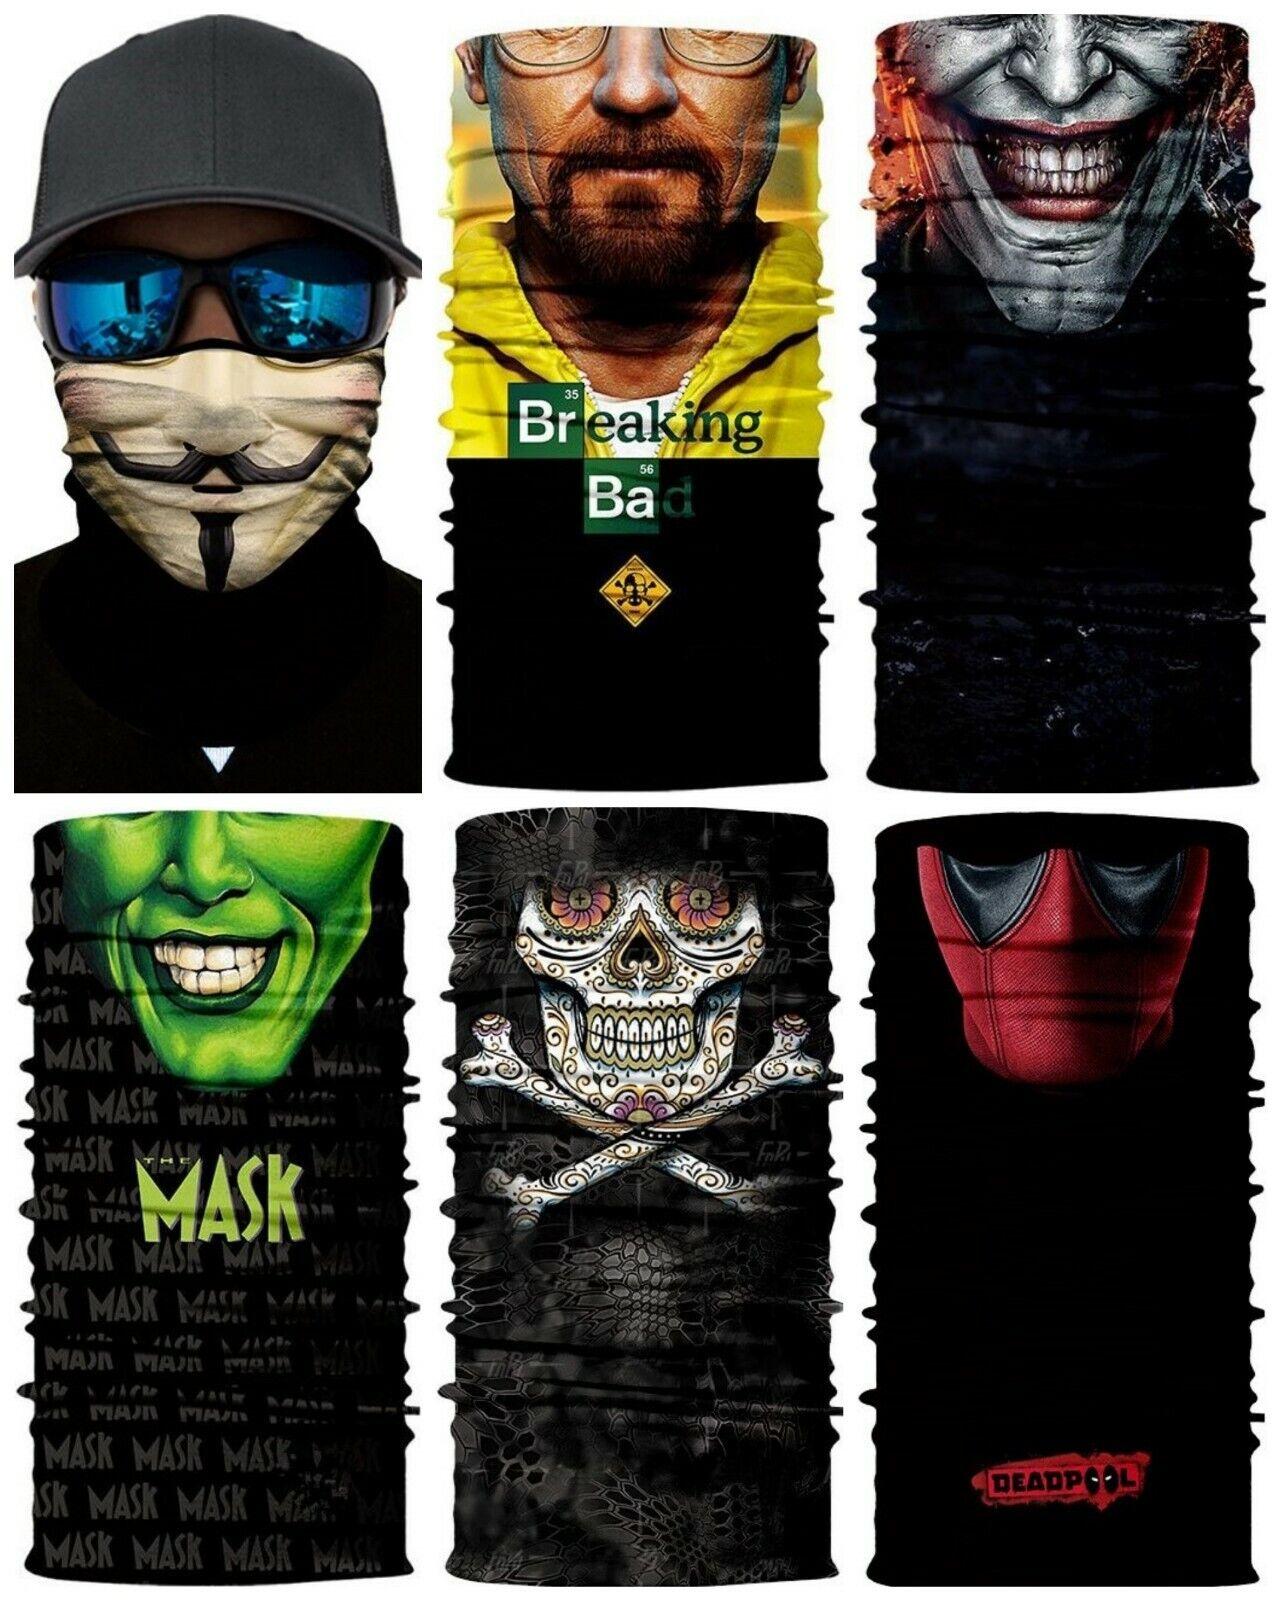 Gesichtsmaske Deadpool Joker Breaking Bad Motorrad Bike Paintball Angeln Jogging